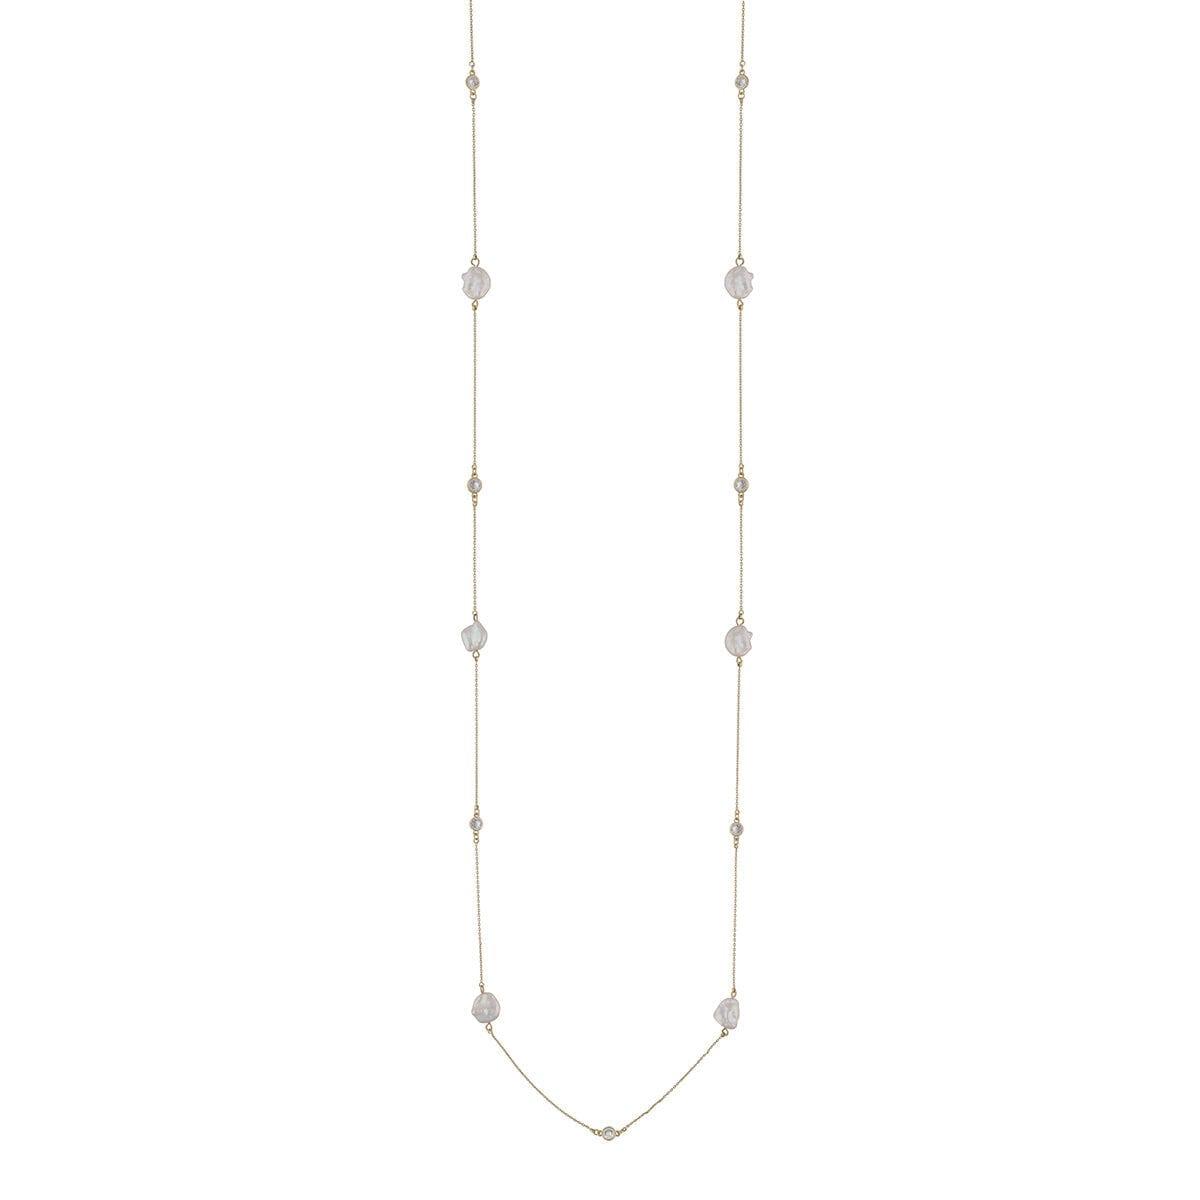 1007-1313362-Shape-pearl-chain-neck-100-g-white